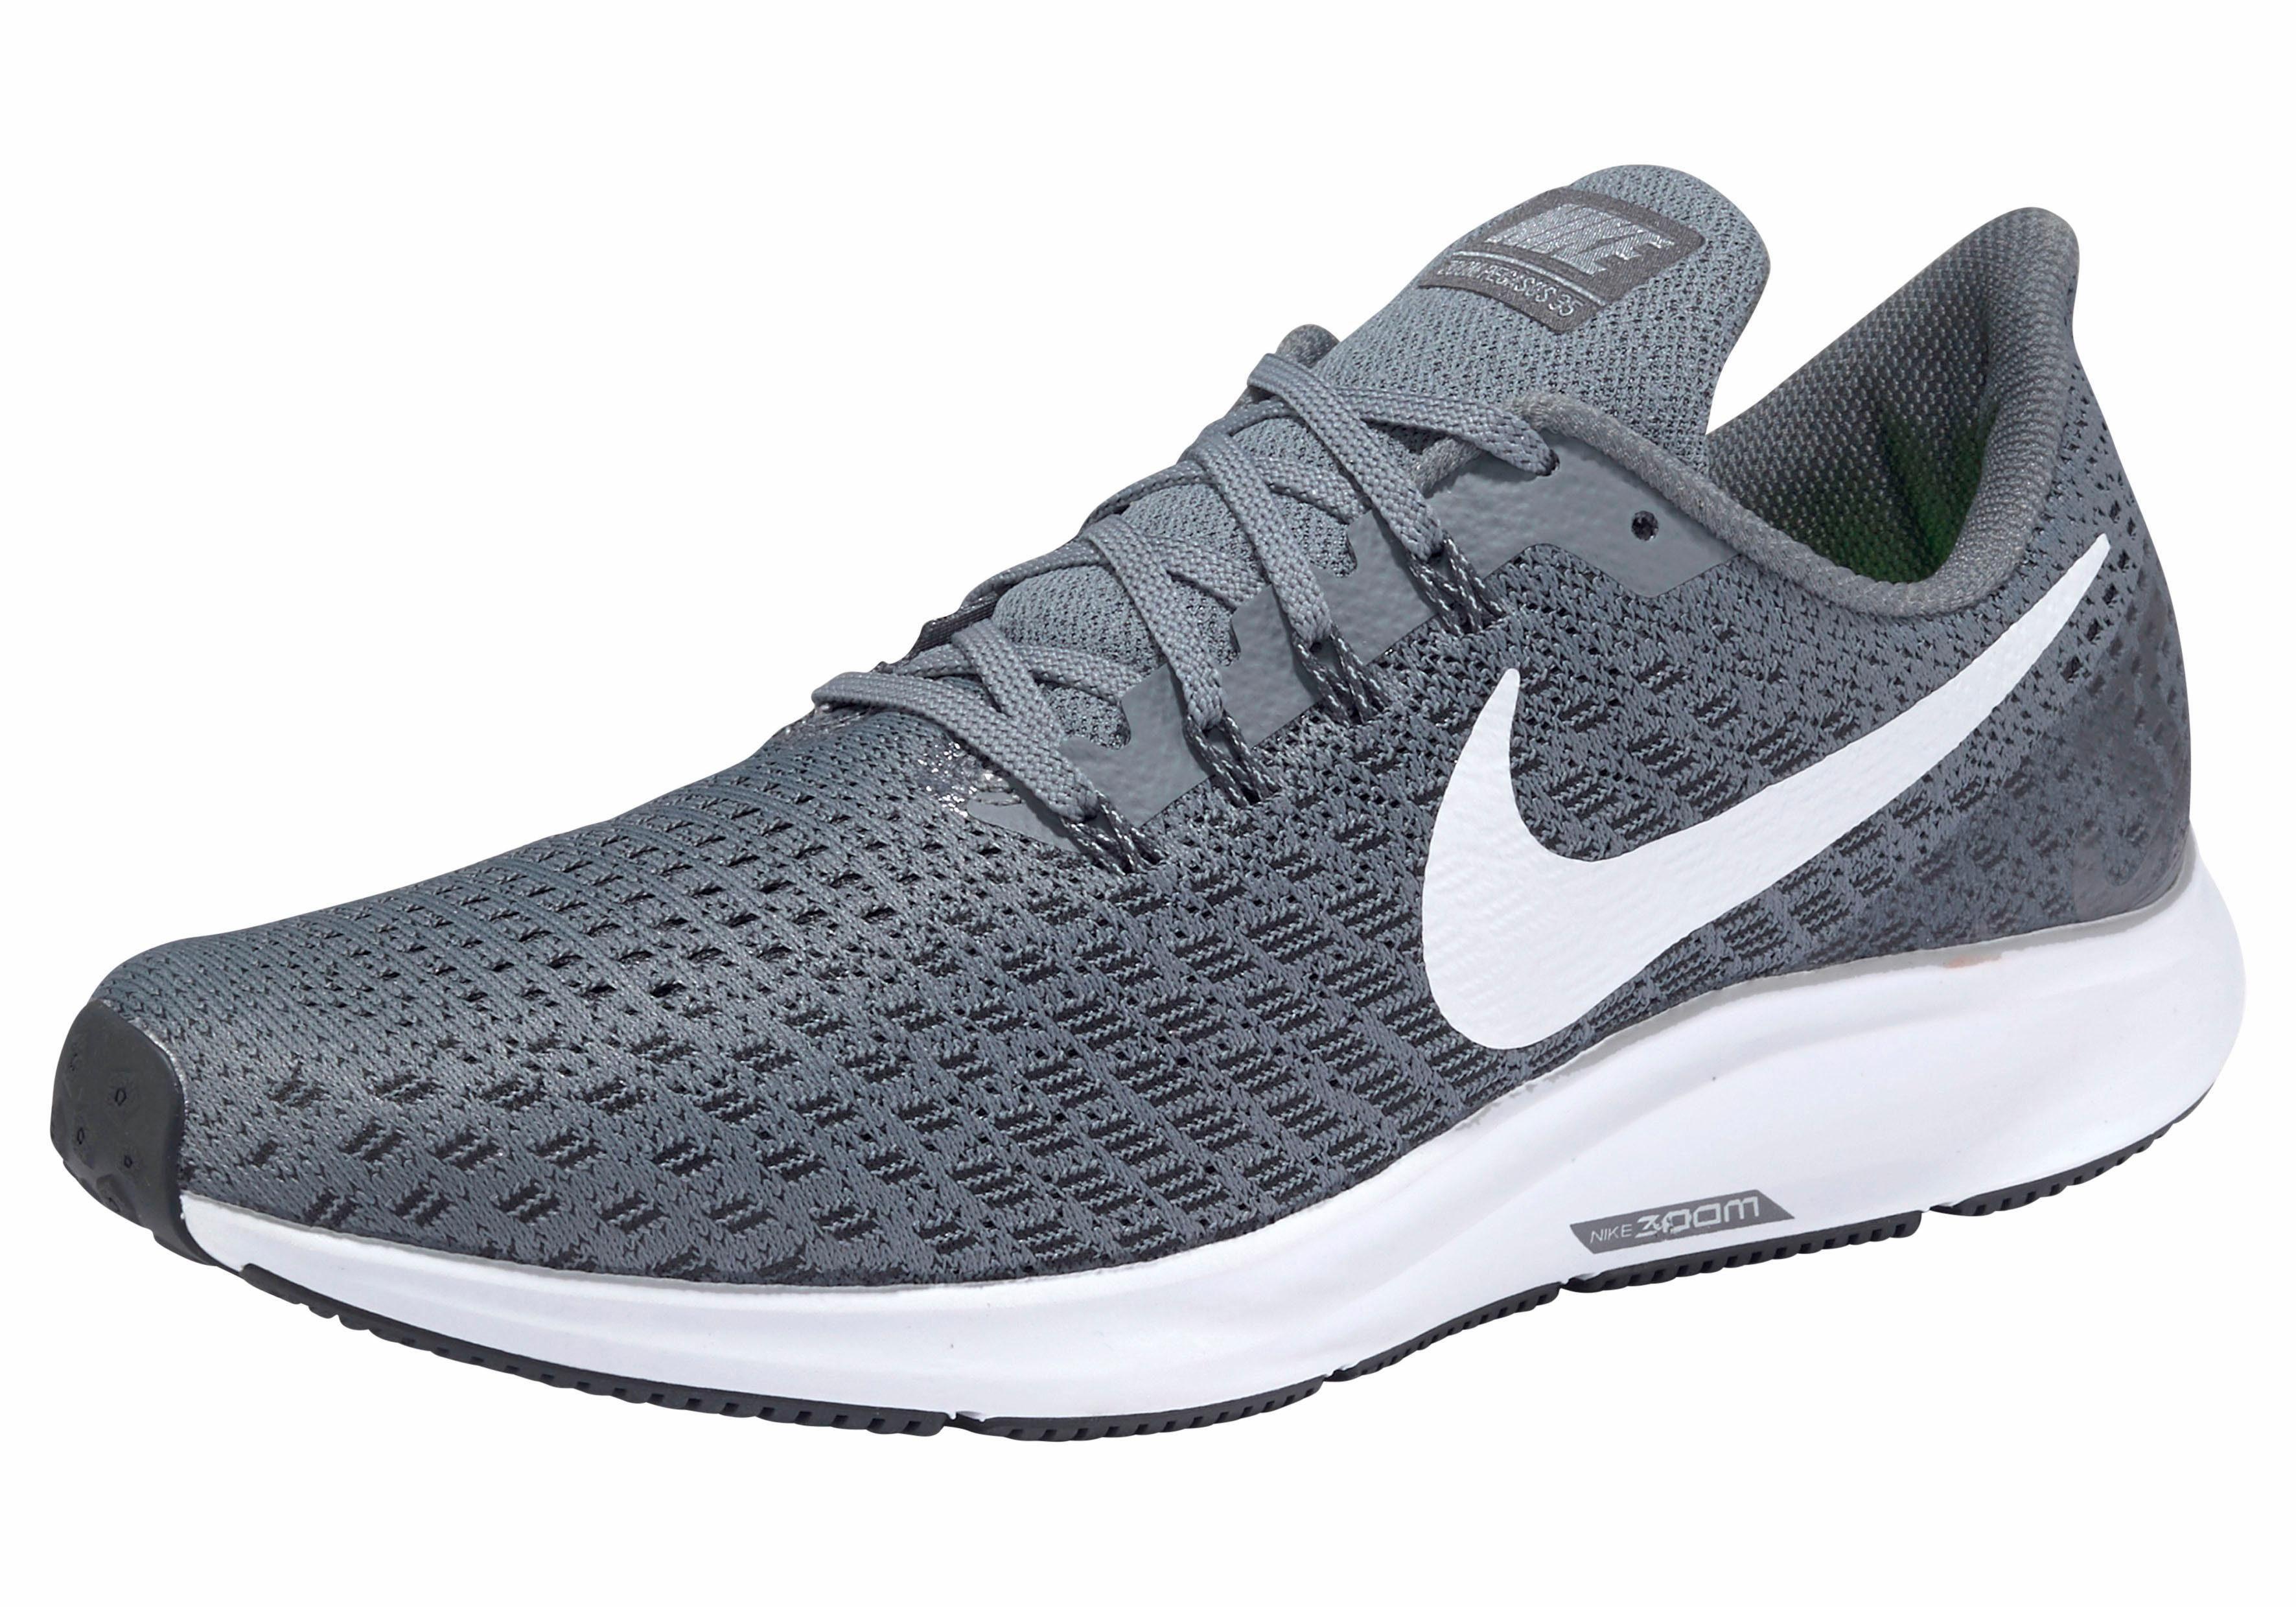 Zoom Nike Pegasus KaufenOtto Online »air 35« Laufschuh wPZOlXkiuT